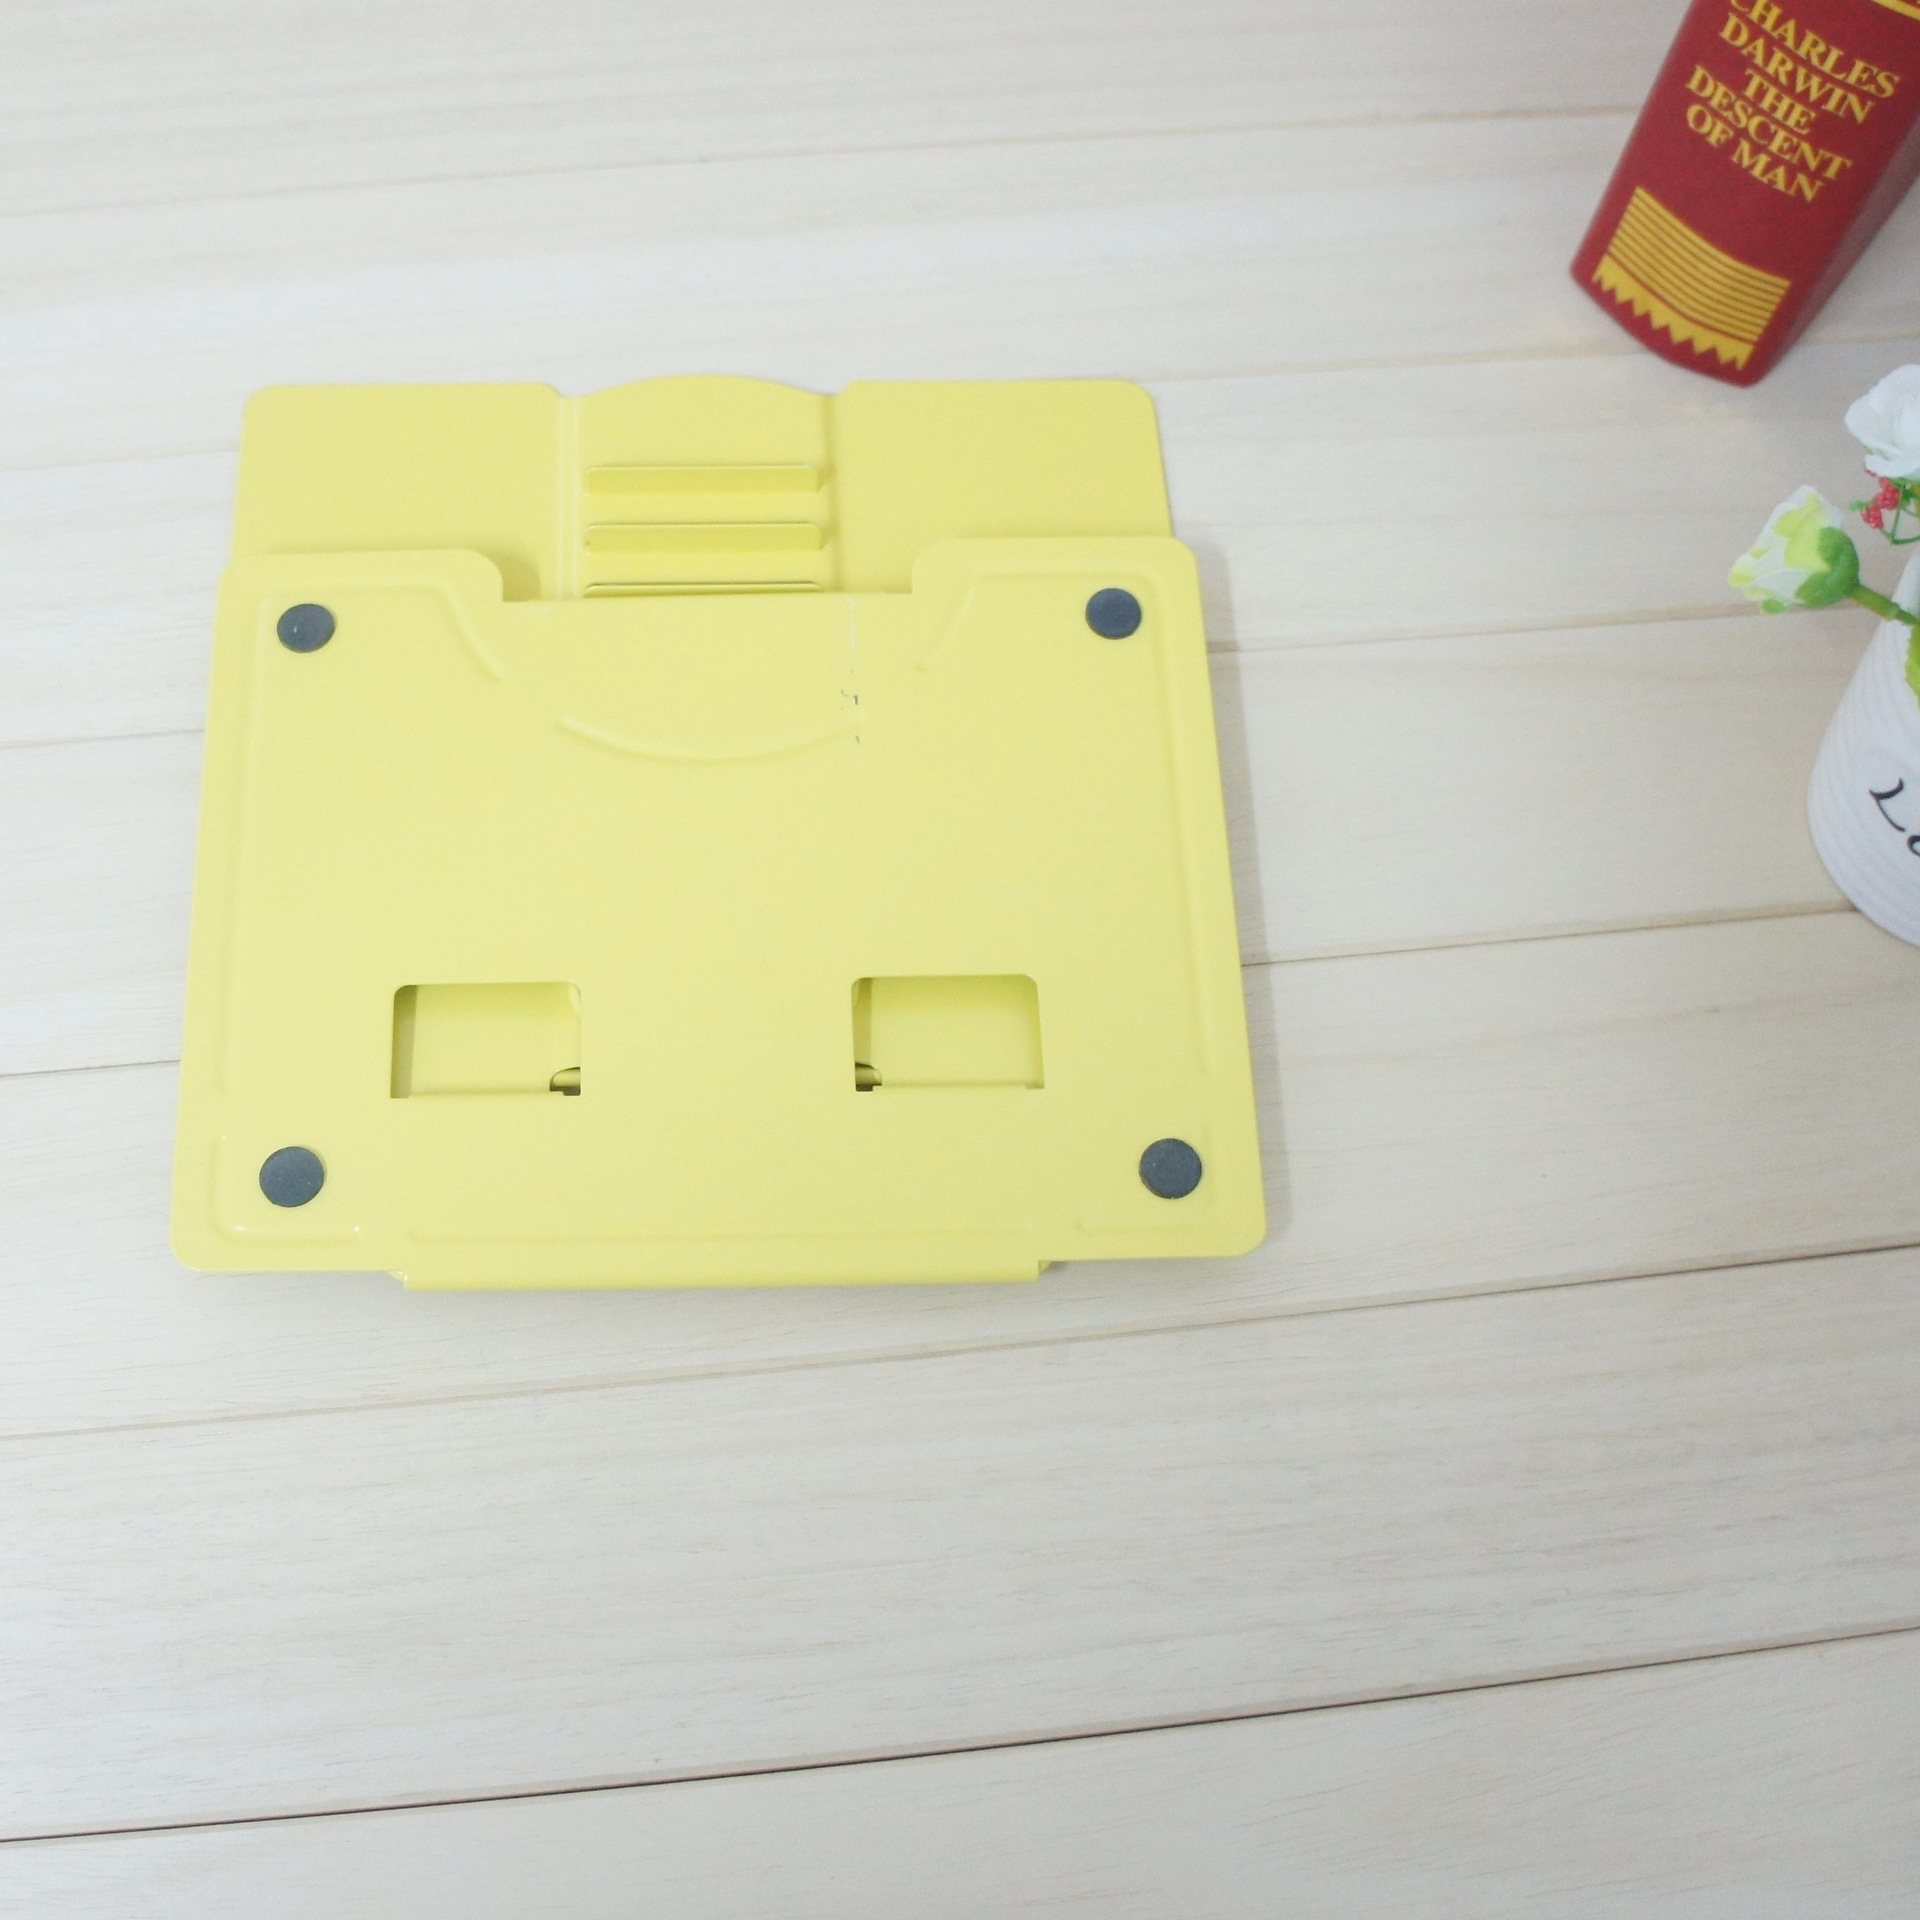 aliexpress cute cartoon papeleria metal book holder for